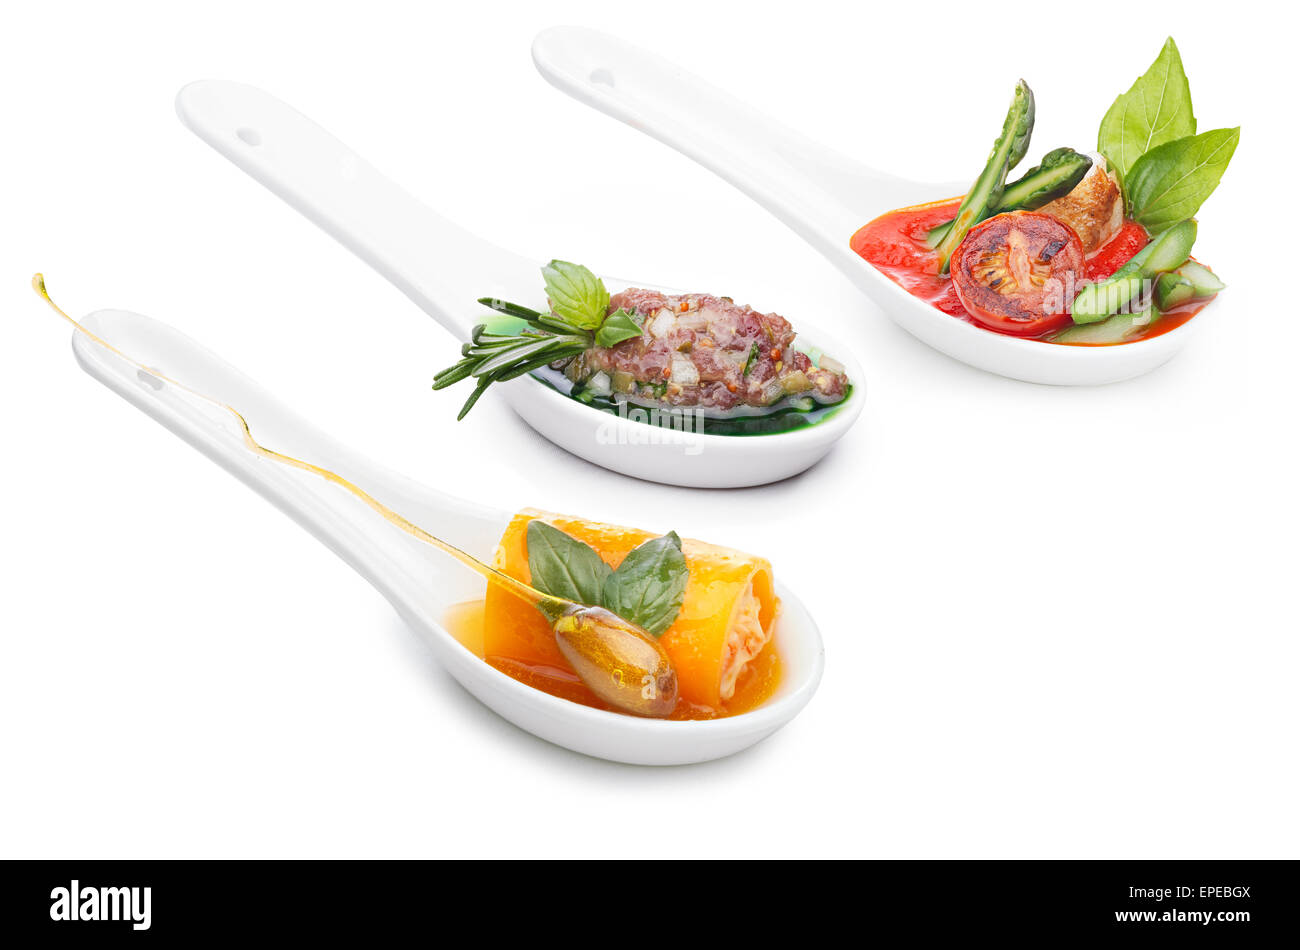 Varietà di antipasti in ceramica cucchiai. Spuntini. Finger food. Foto Stock